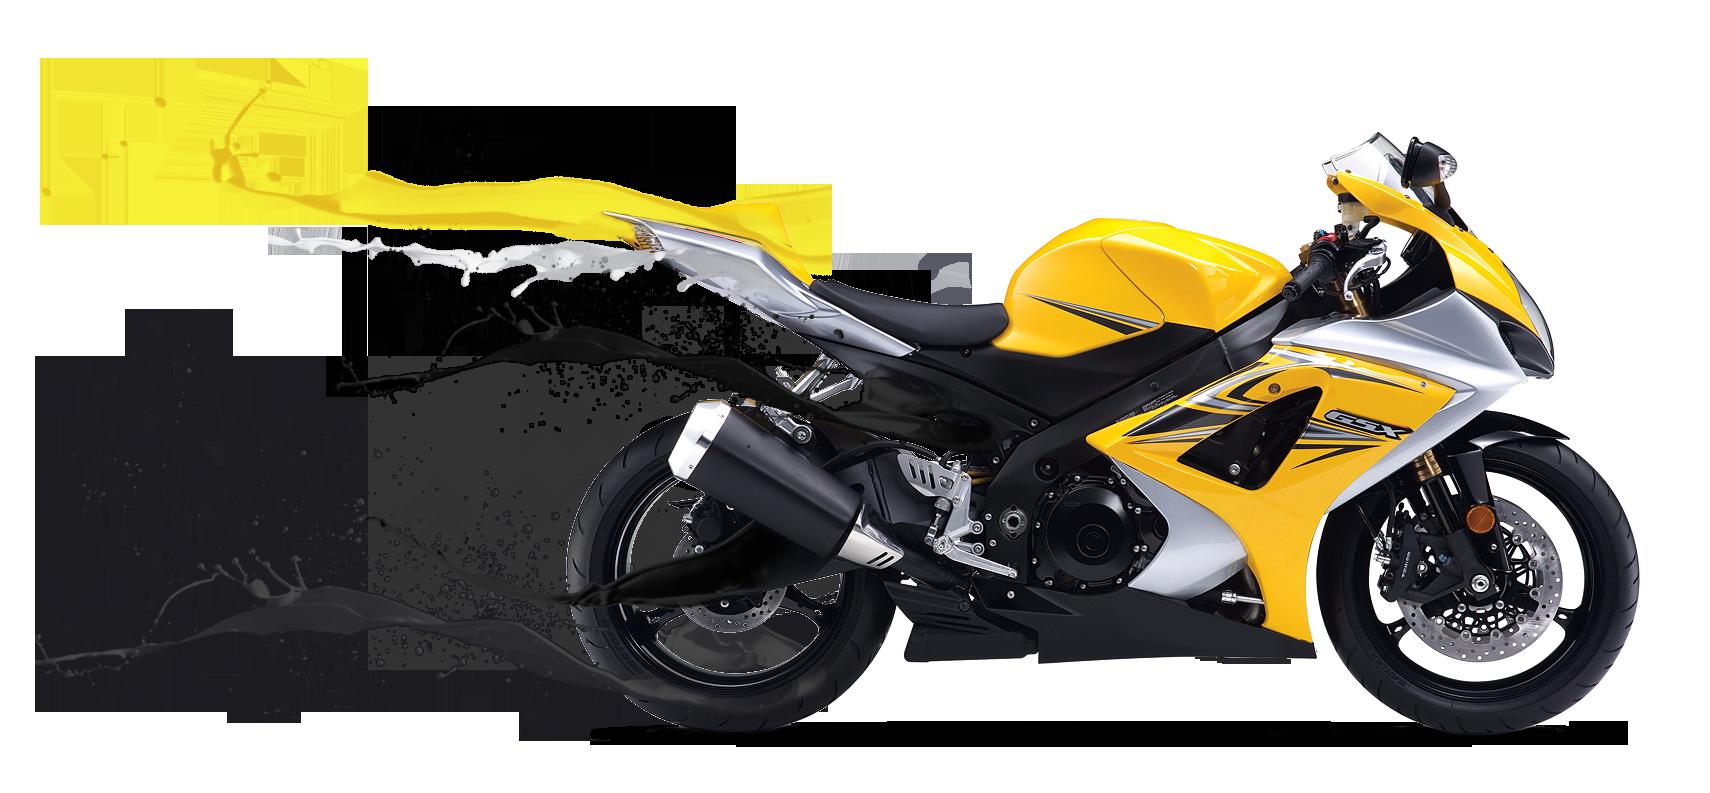 Motorbike Png File - Motorbike, Transparent background PNG HD thumbnail